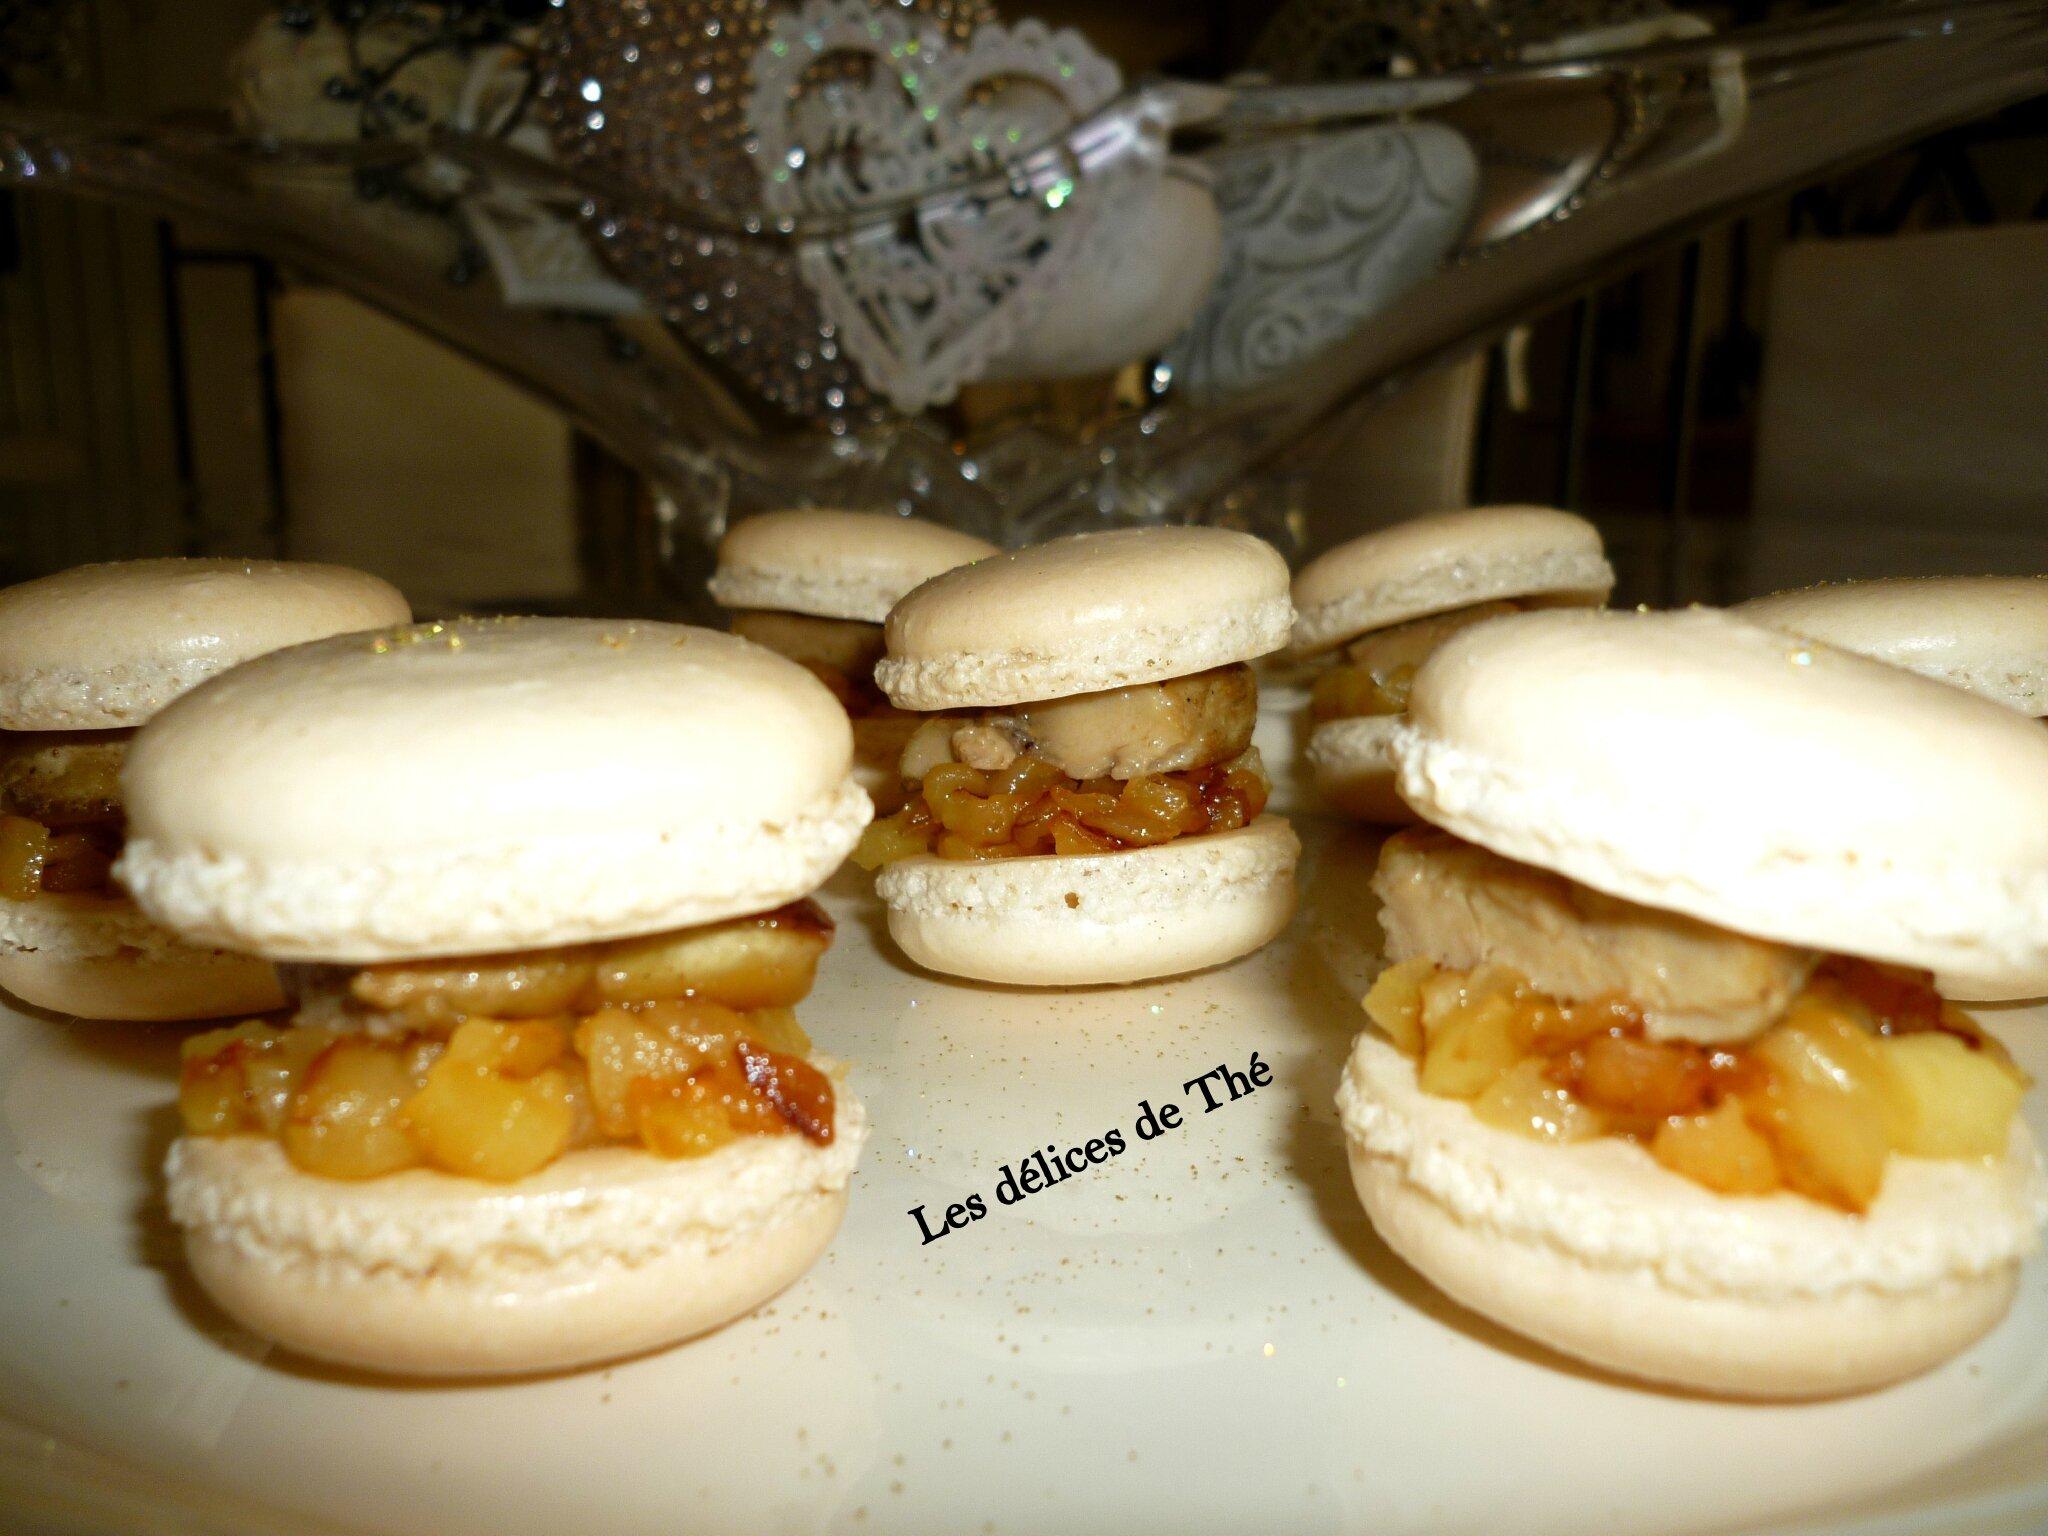 Macaron Escalope de foie gras/pomme